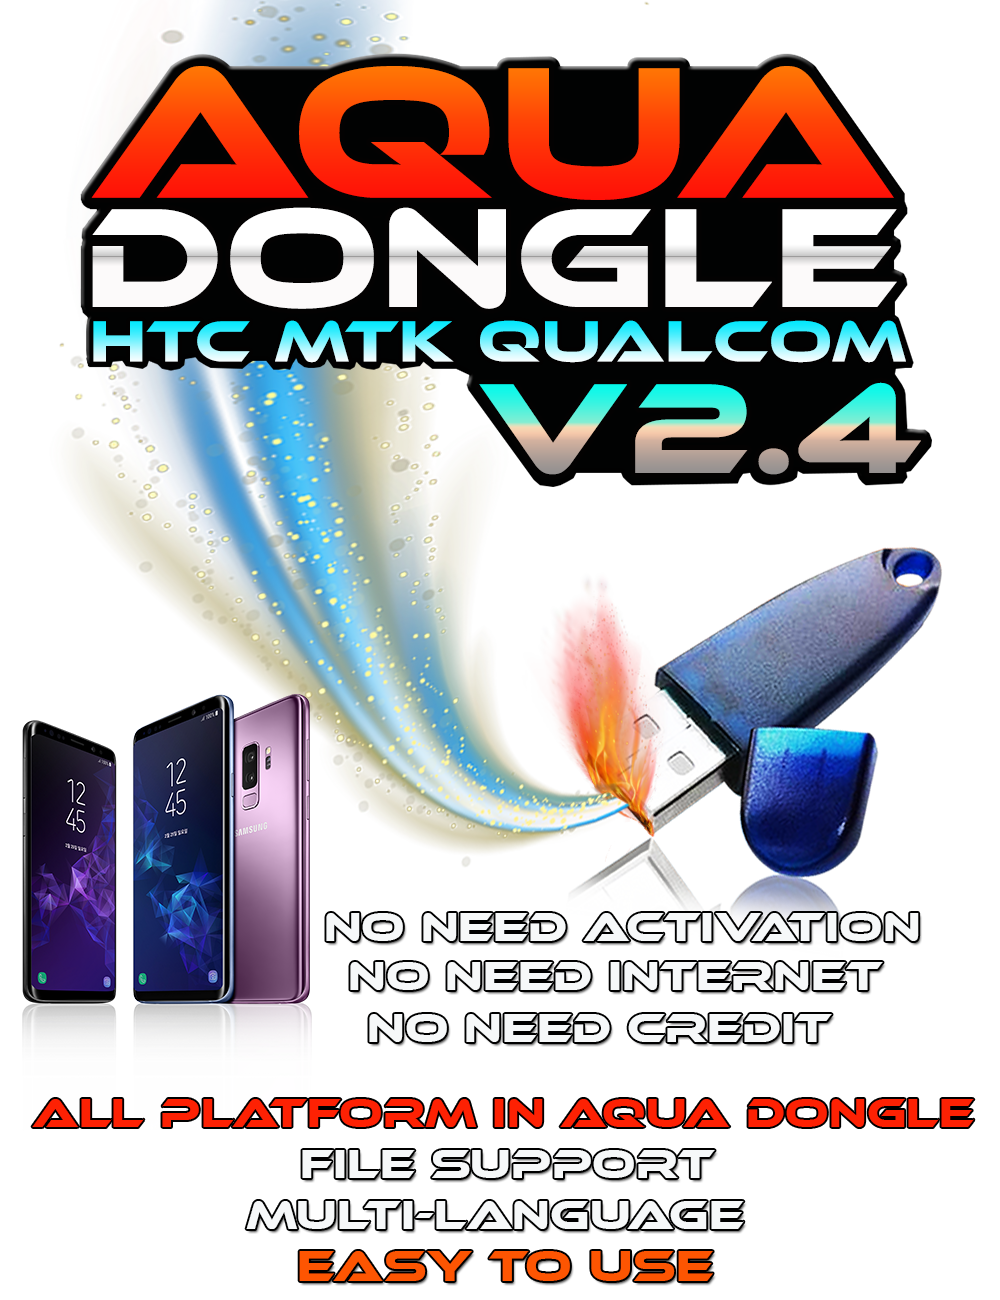 AQUA Dongle v2.4 A.I.O BIG Update MTK Qualcomm Vivo Oppo Lg Sony & More 27/6/2020